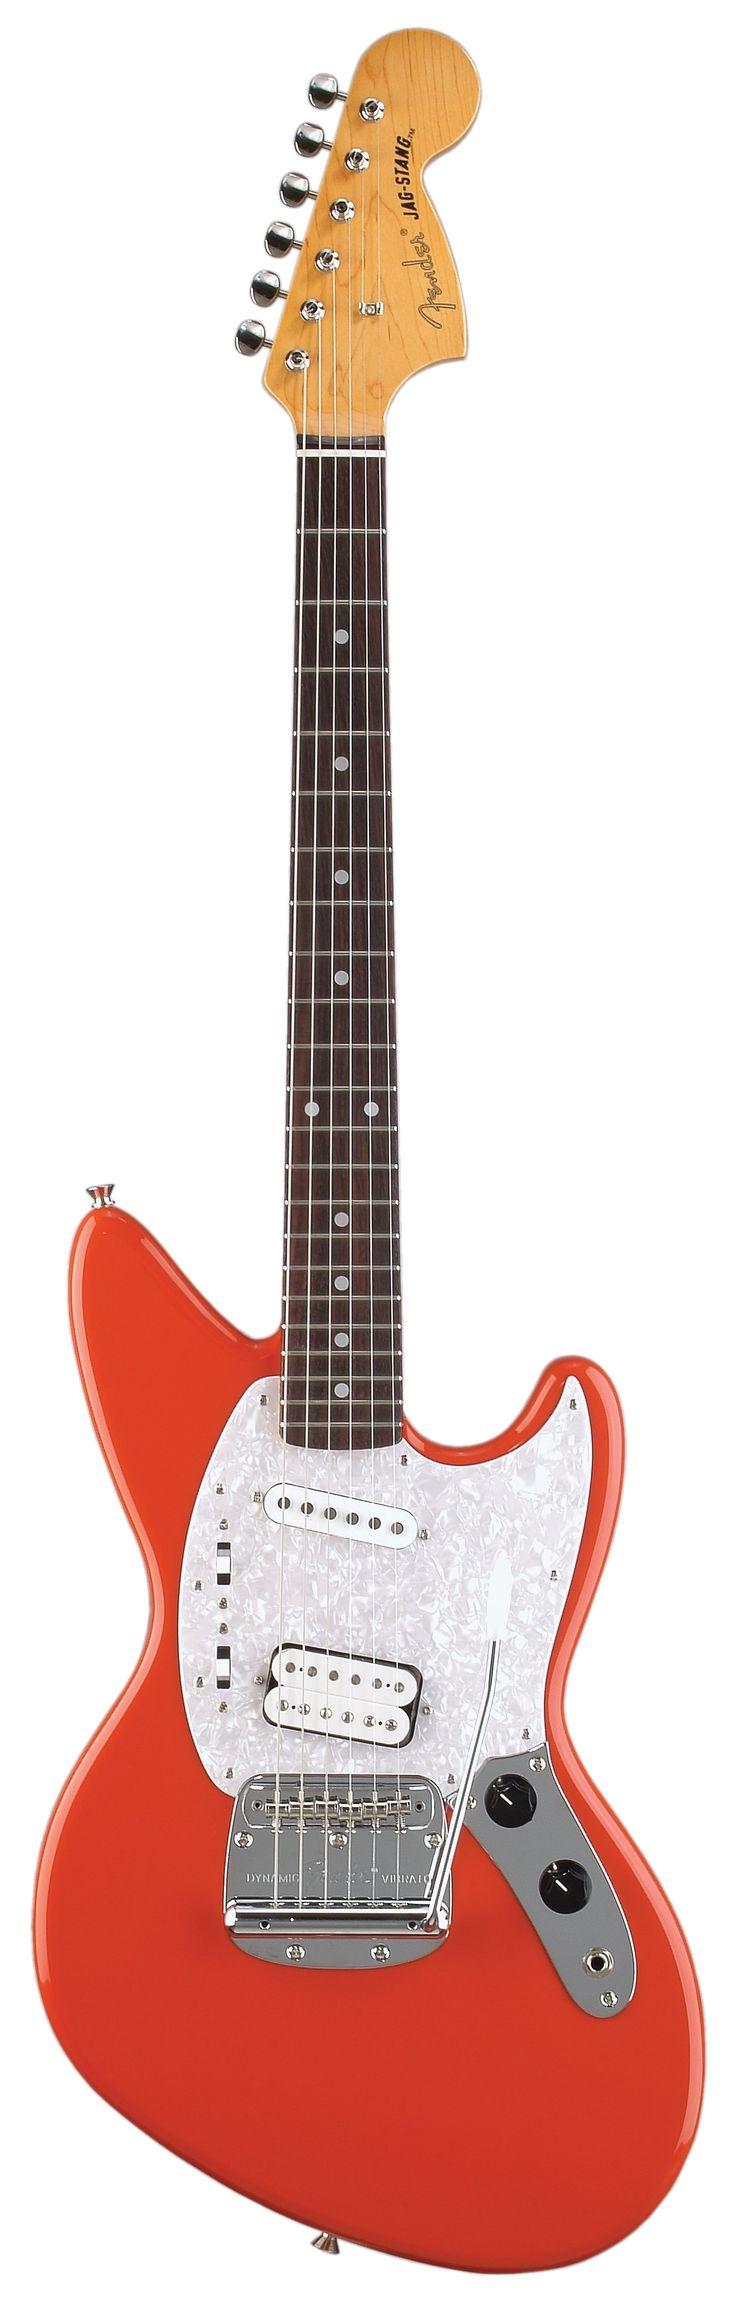 Fender Jag - Stang